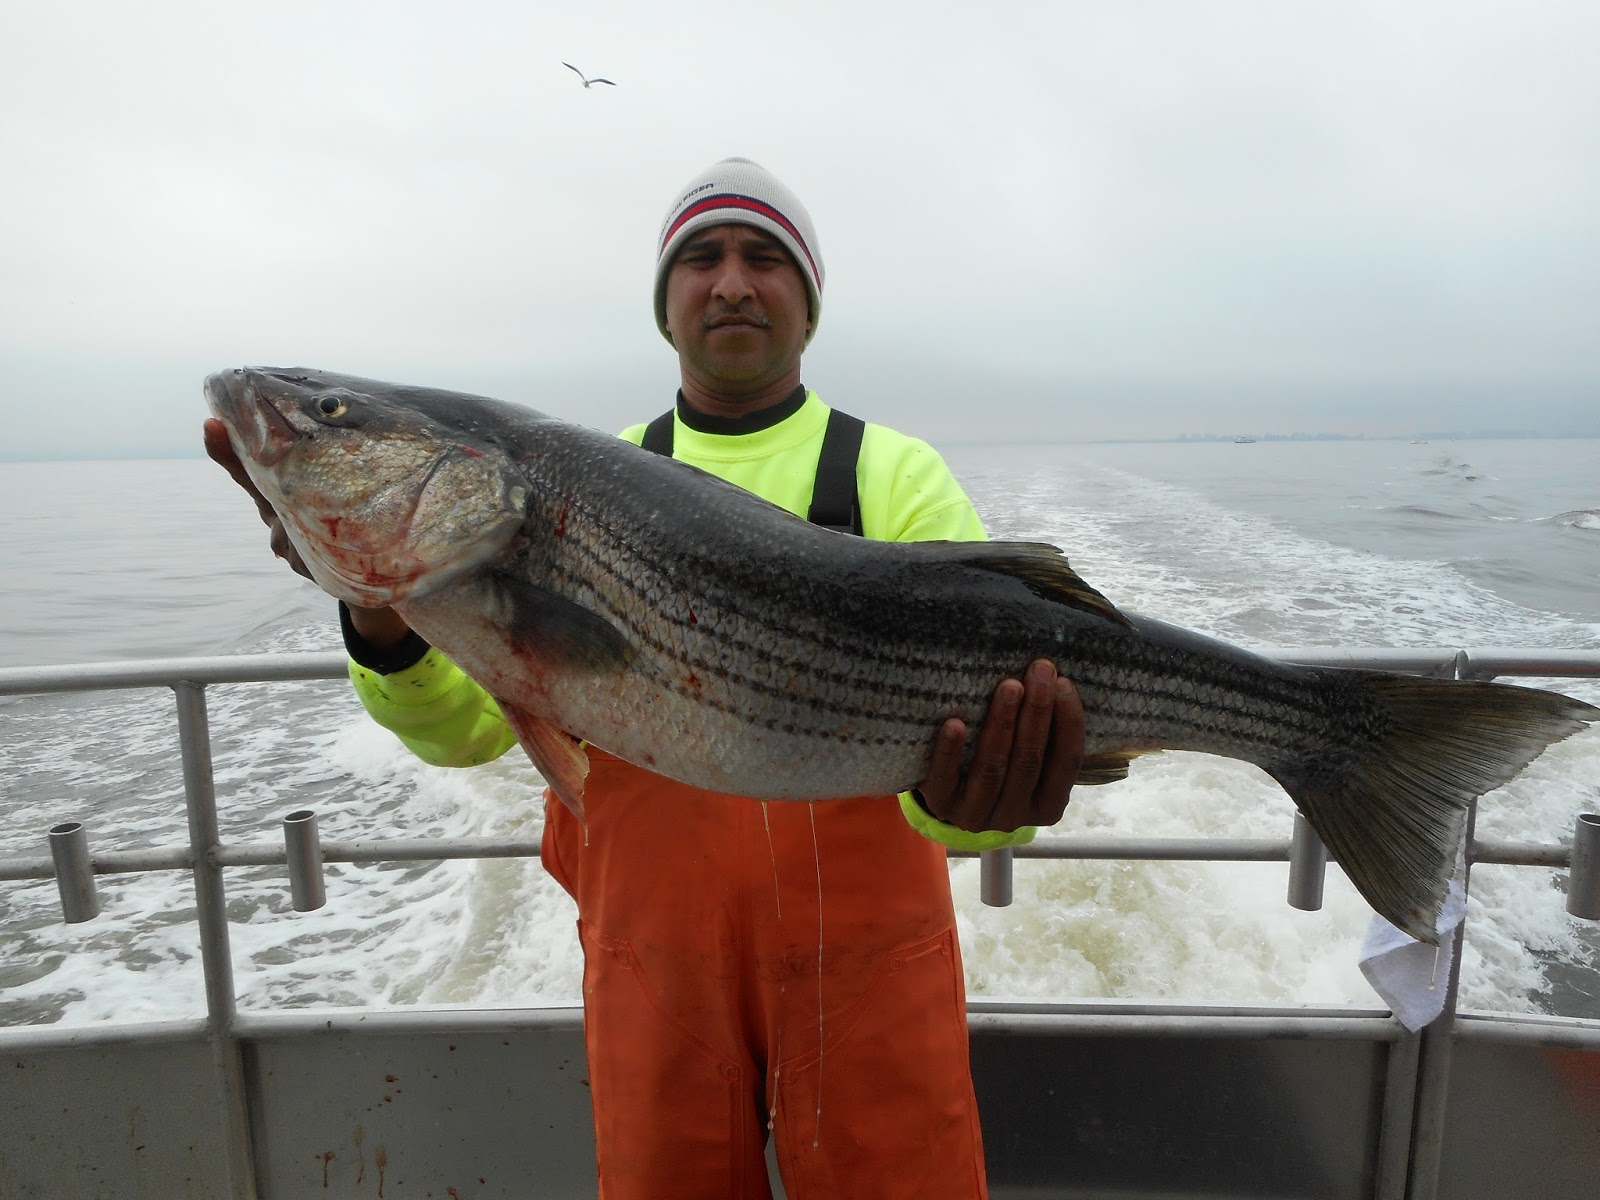 Nj salt fish 2016 05 07 seahunter atlantic highlands for Atlantic highlands fishing report